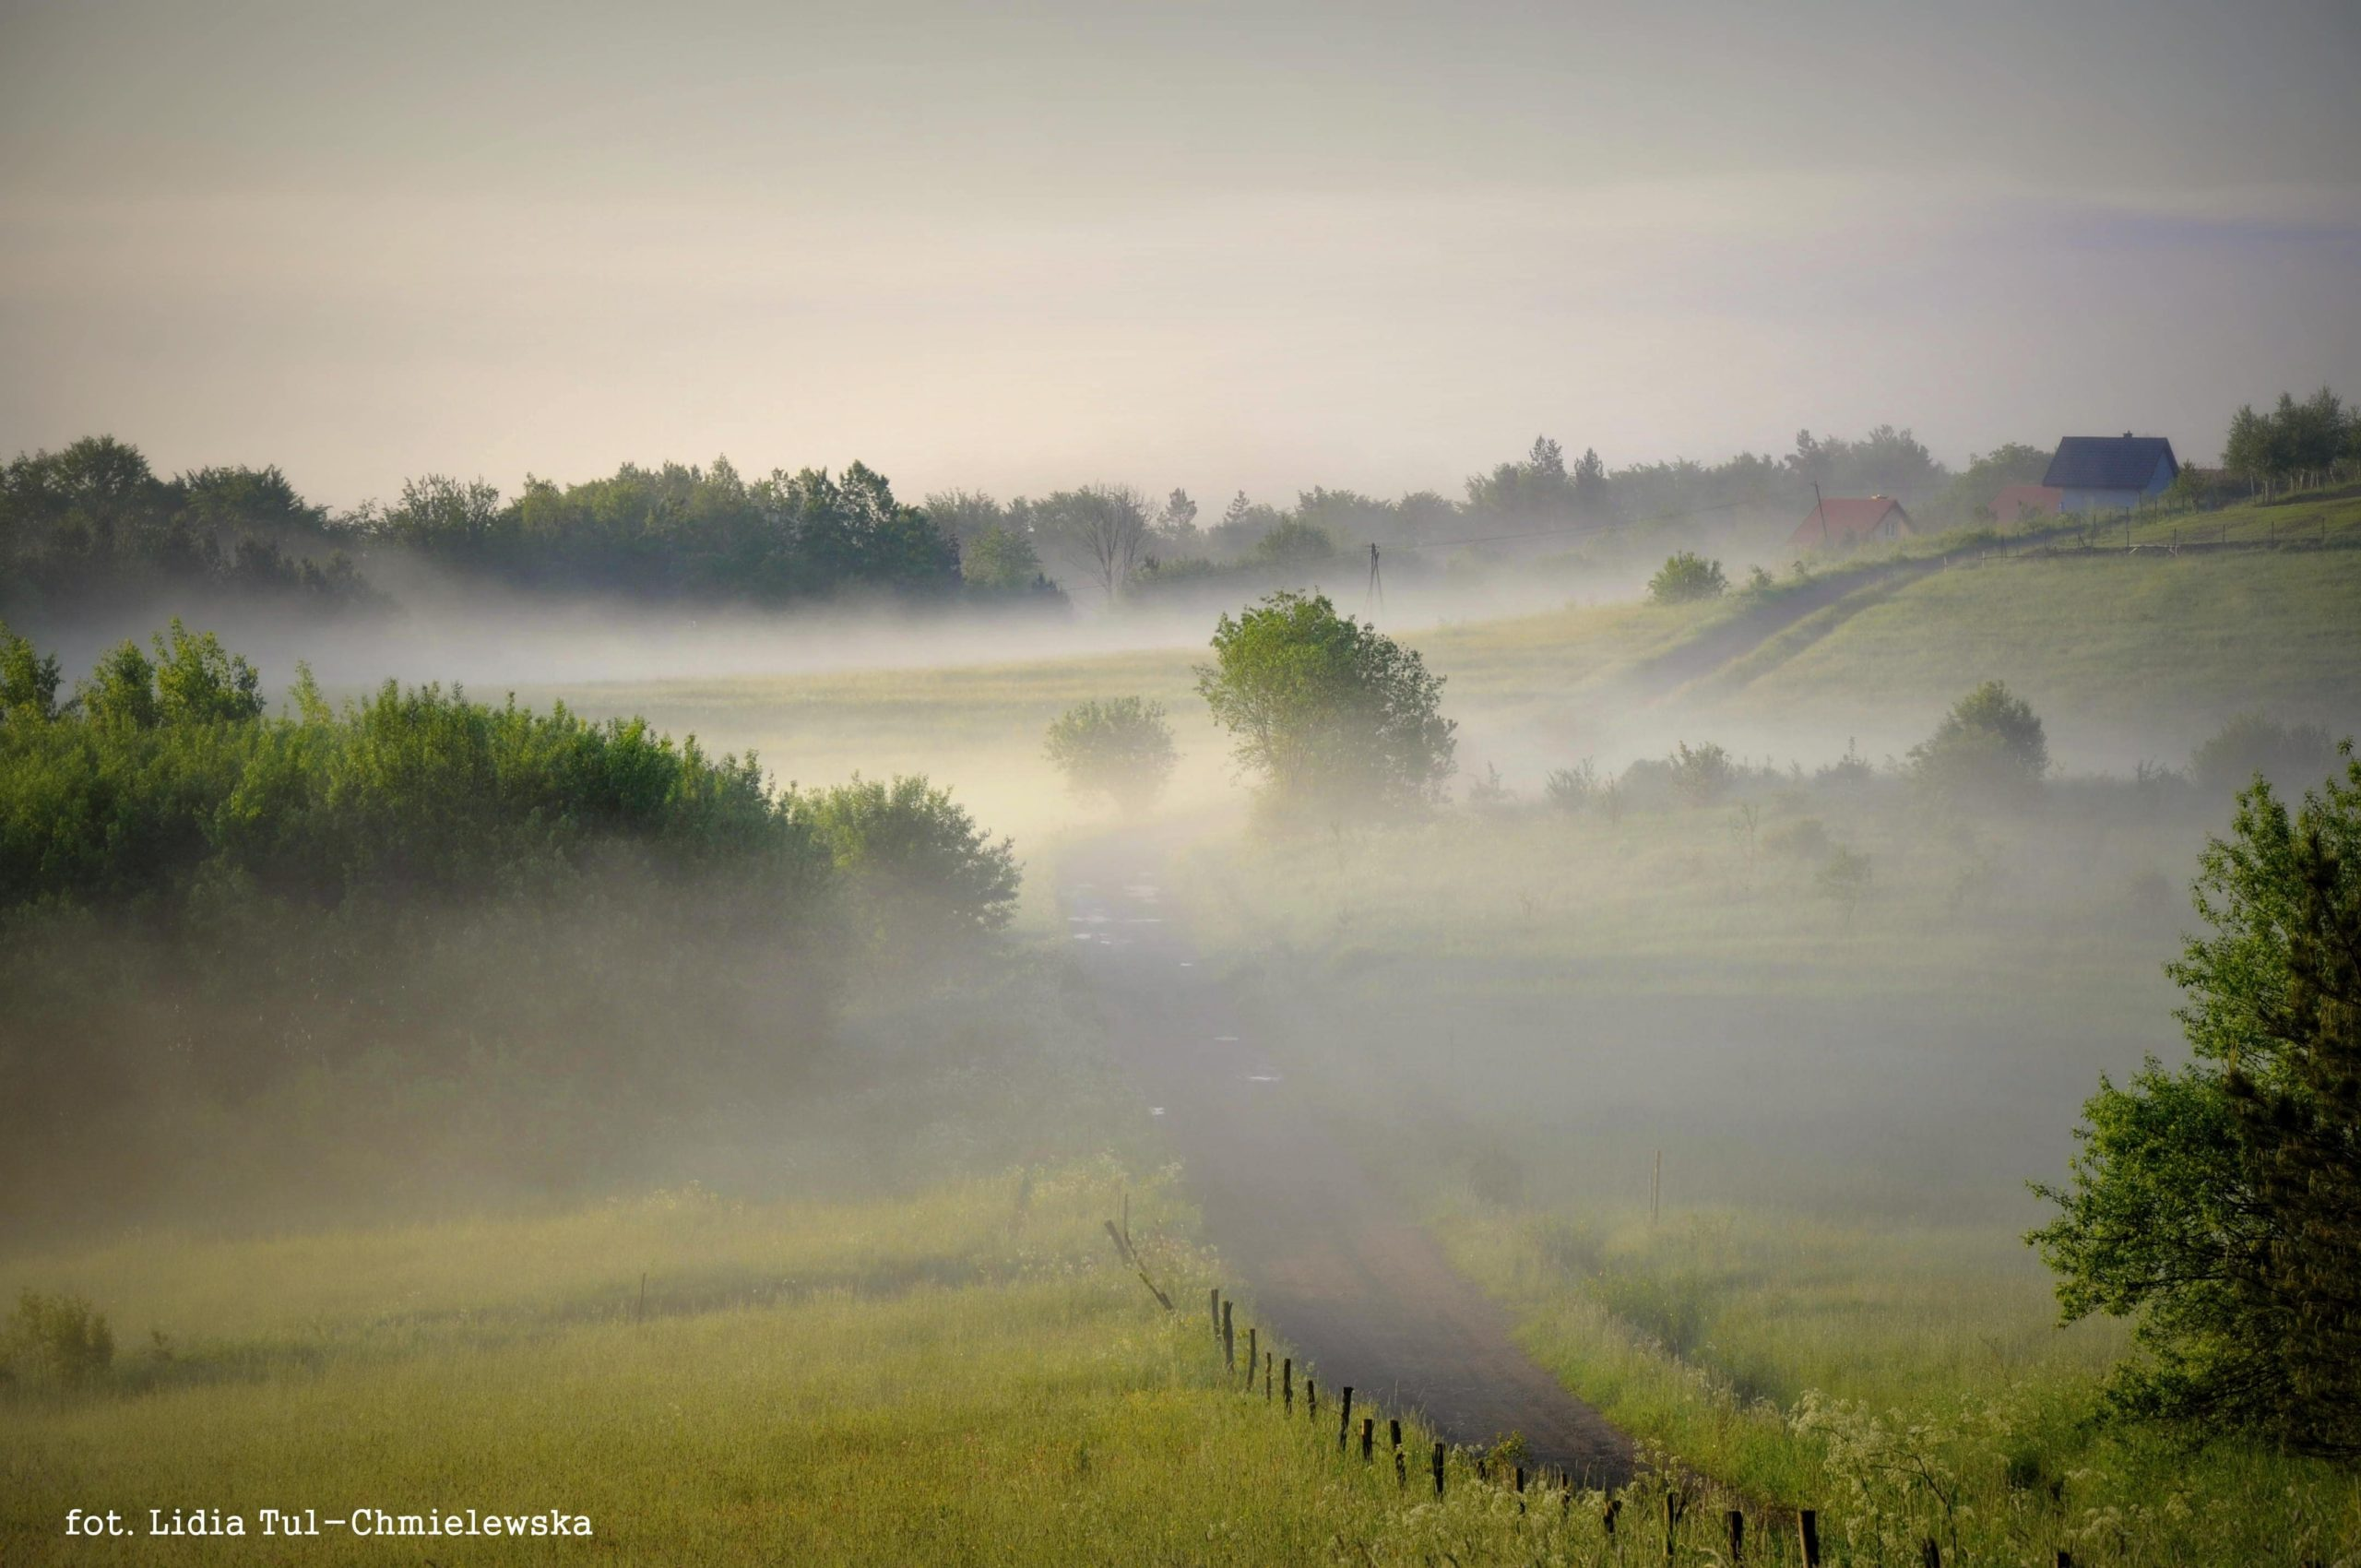 Świtania/ fot. Lidia Tul-Chmielewska